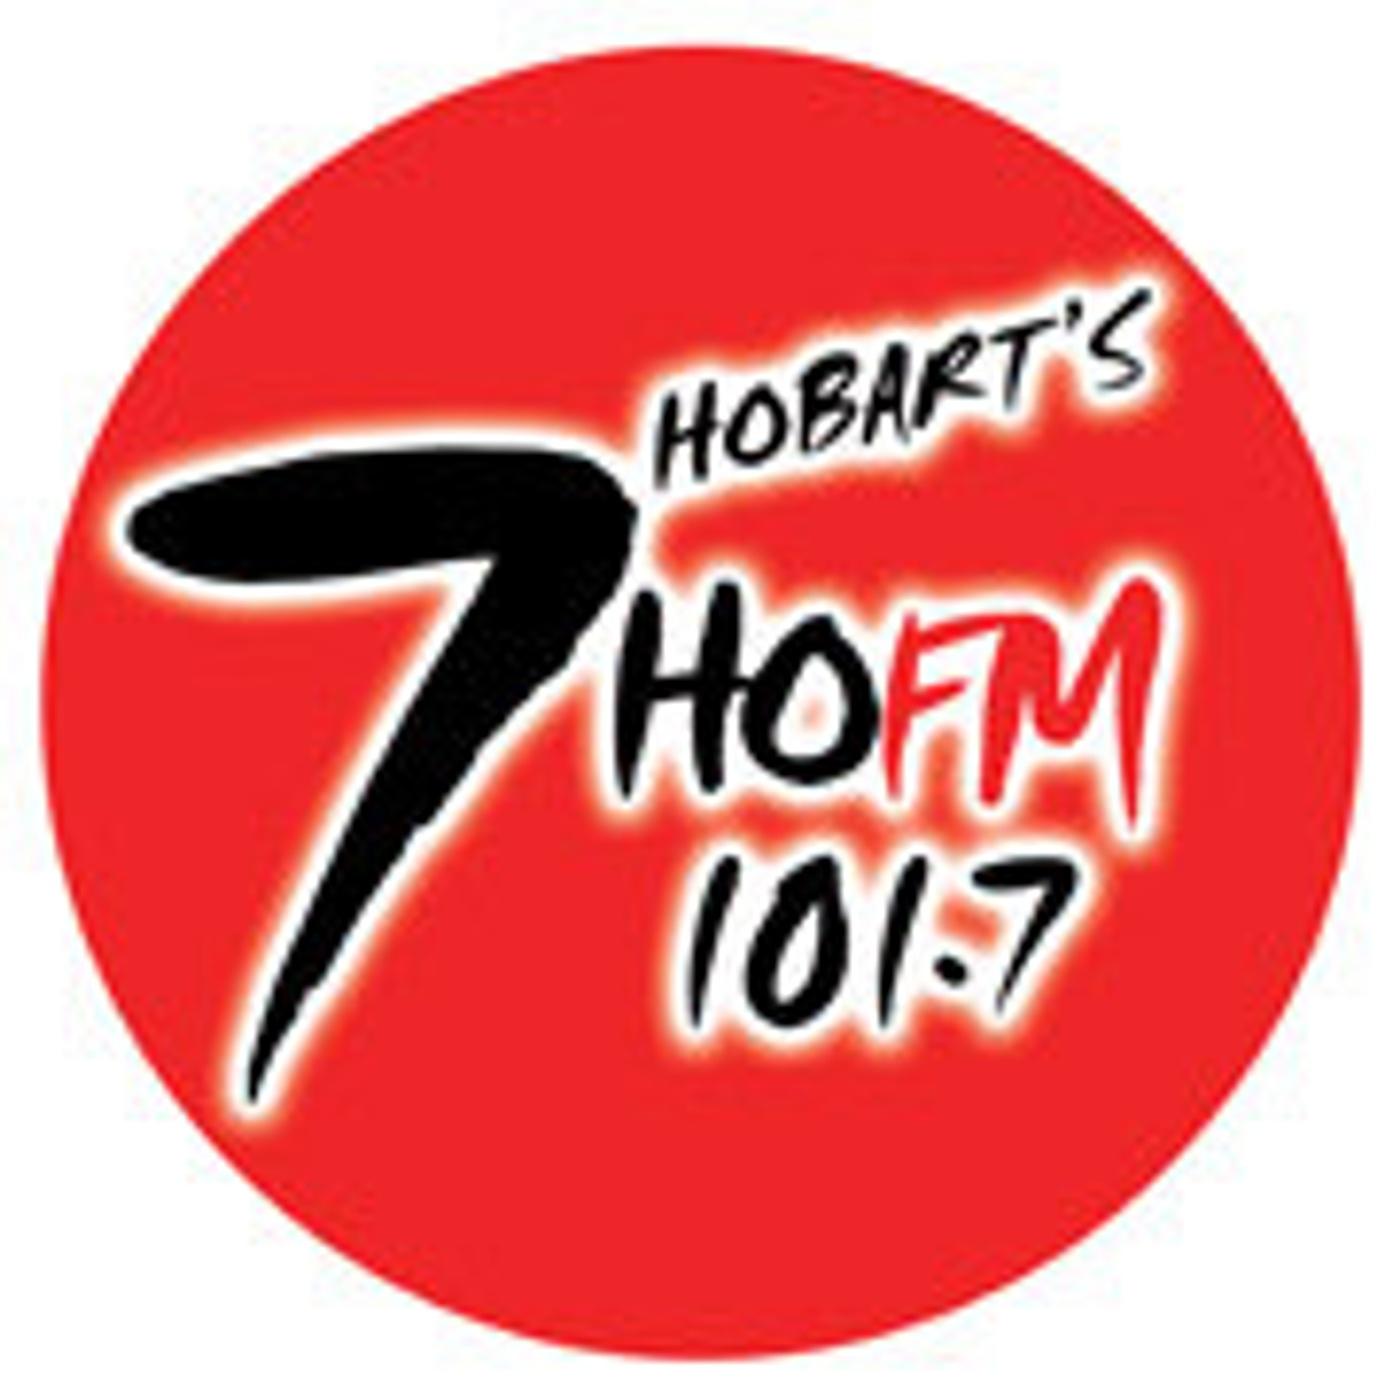 Nnifpmss6e4dki2akh0o radio 7hofm logo